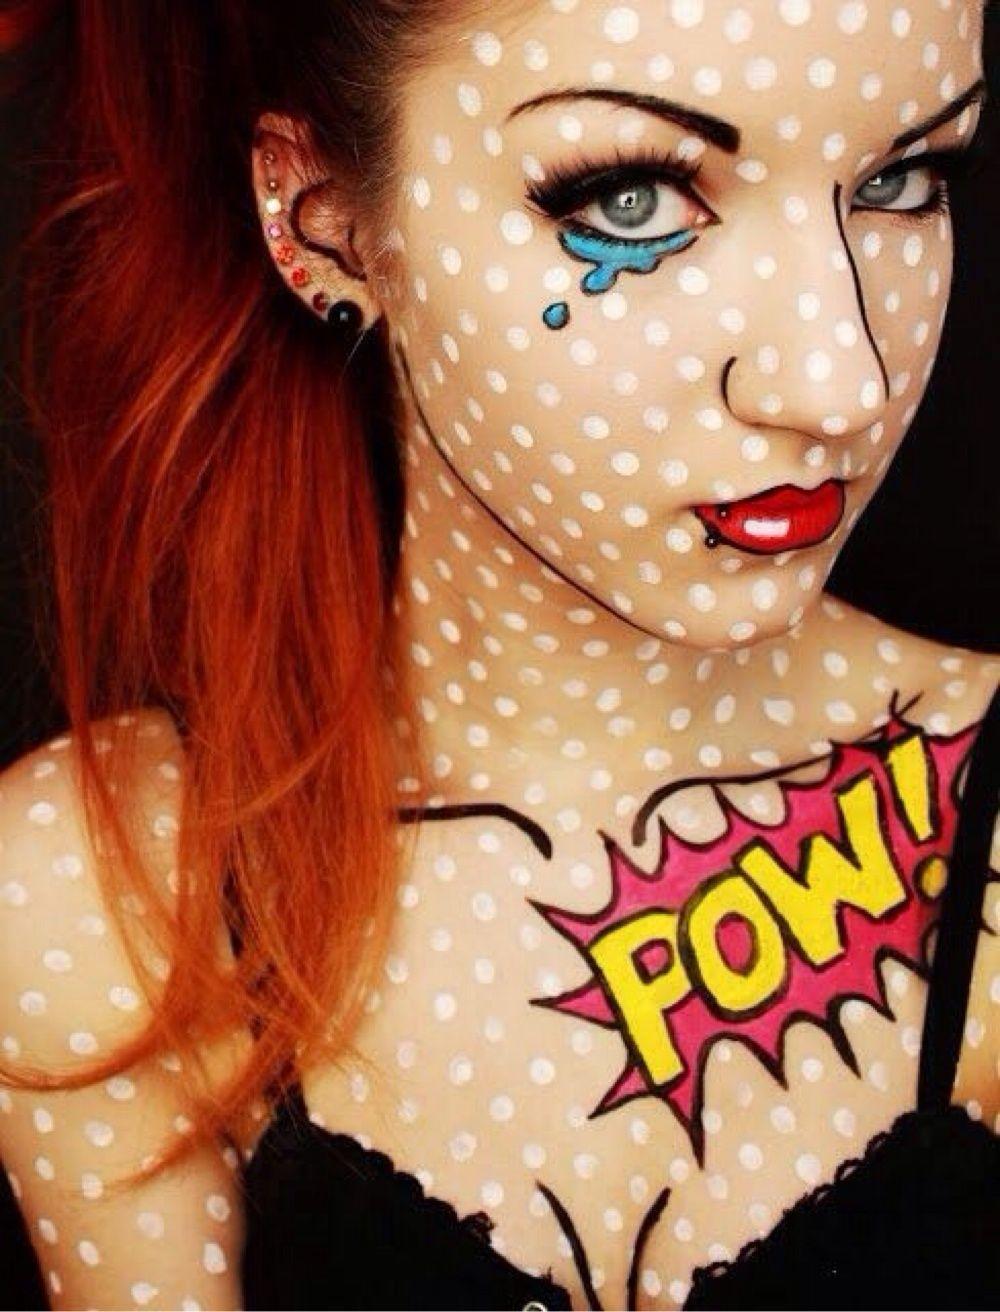 Comic book girl found on 10 best halloween makeup tutorials blog found on 10 best halloween makeup tutorials blog mywebroom10 best baditri Image collections